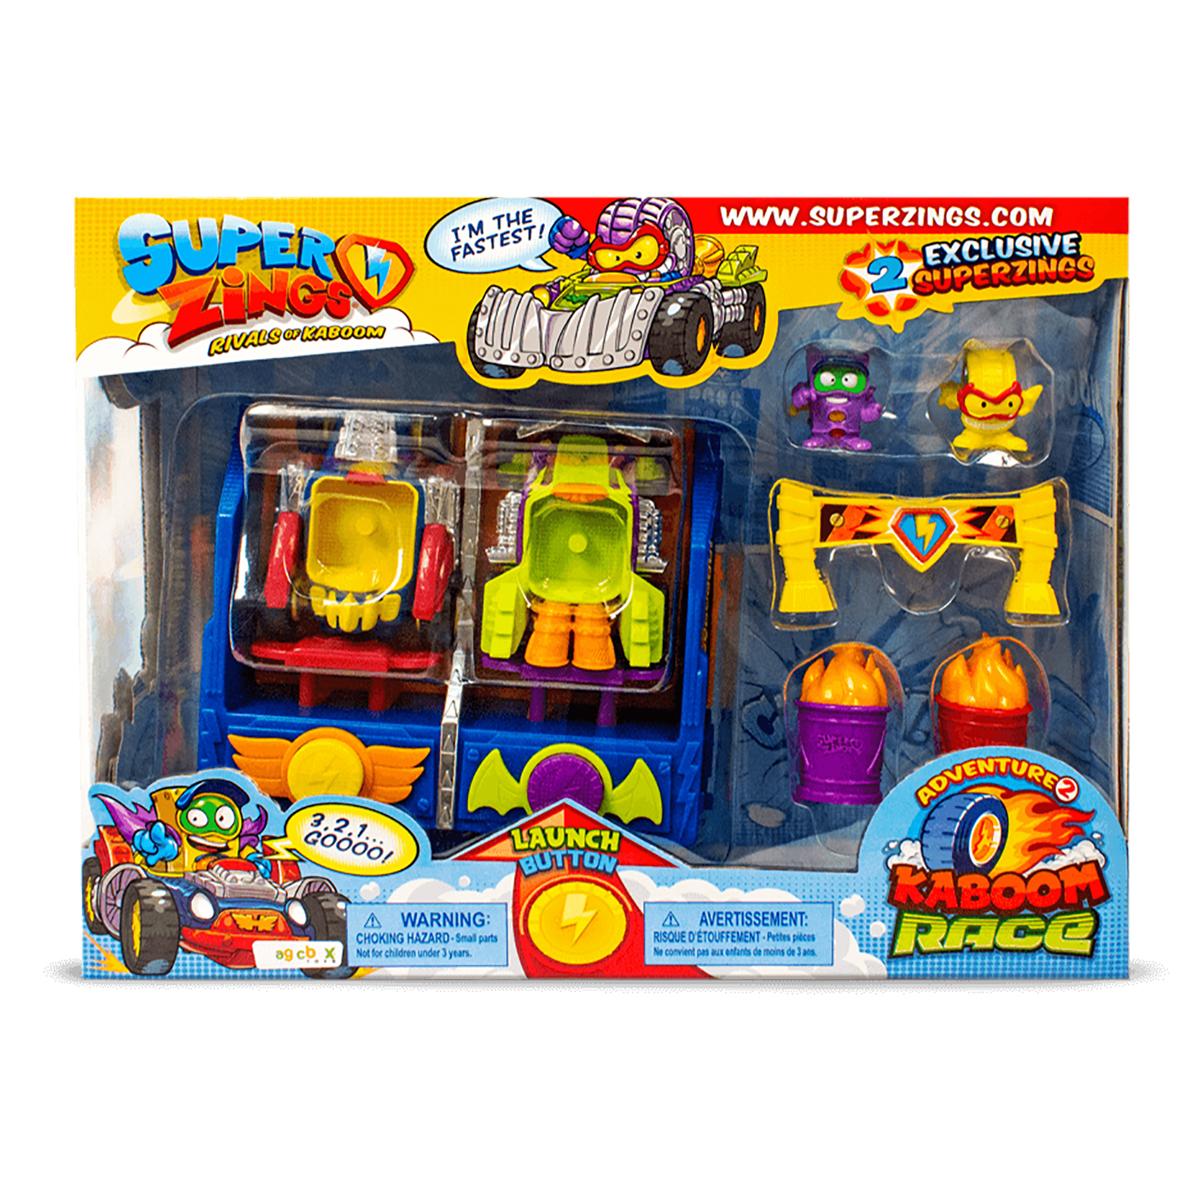 Set de joaca cu 2 figurine SuperZings, Cursa Kaboom